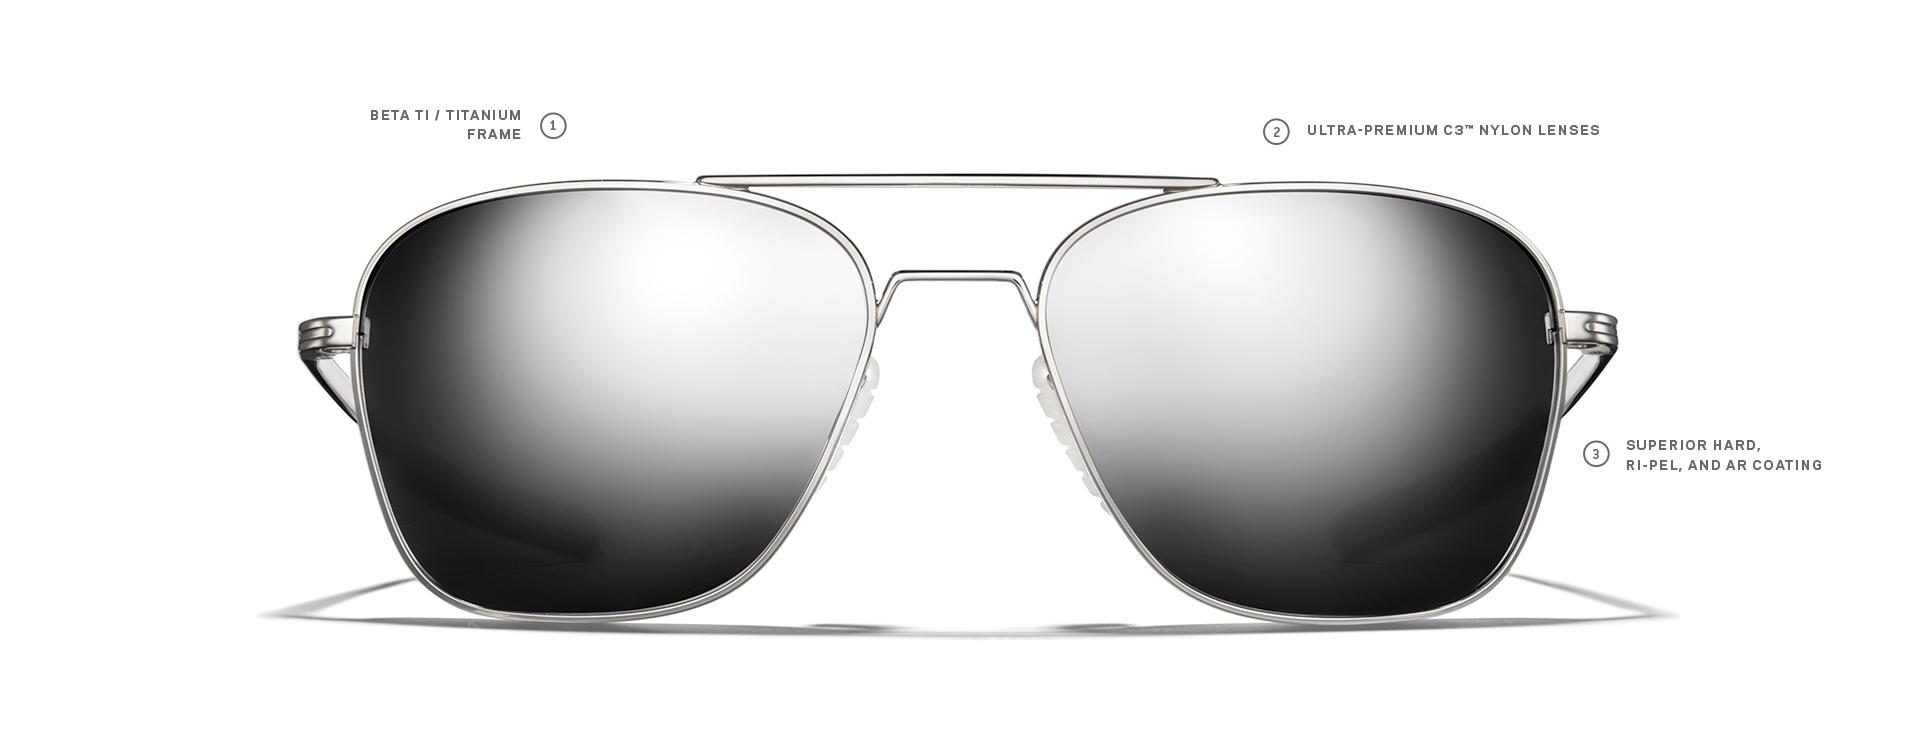 a80afe6194c Square Aviators - Running Sunglasses - Sports Sunglasses